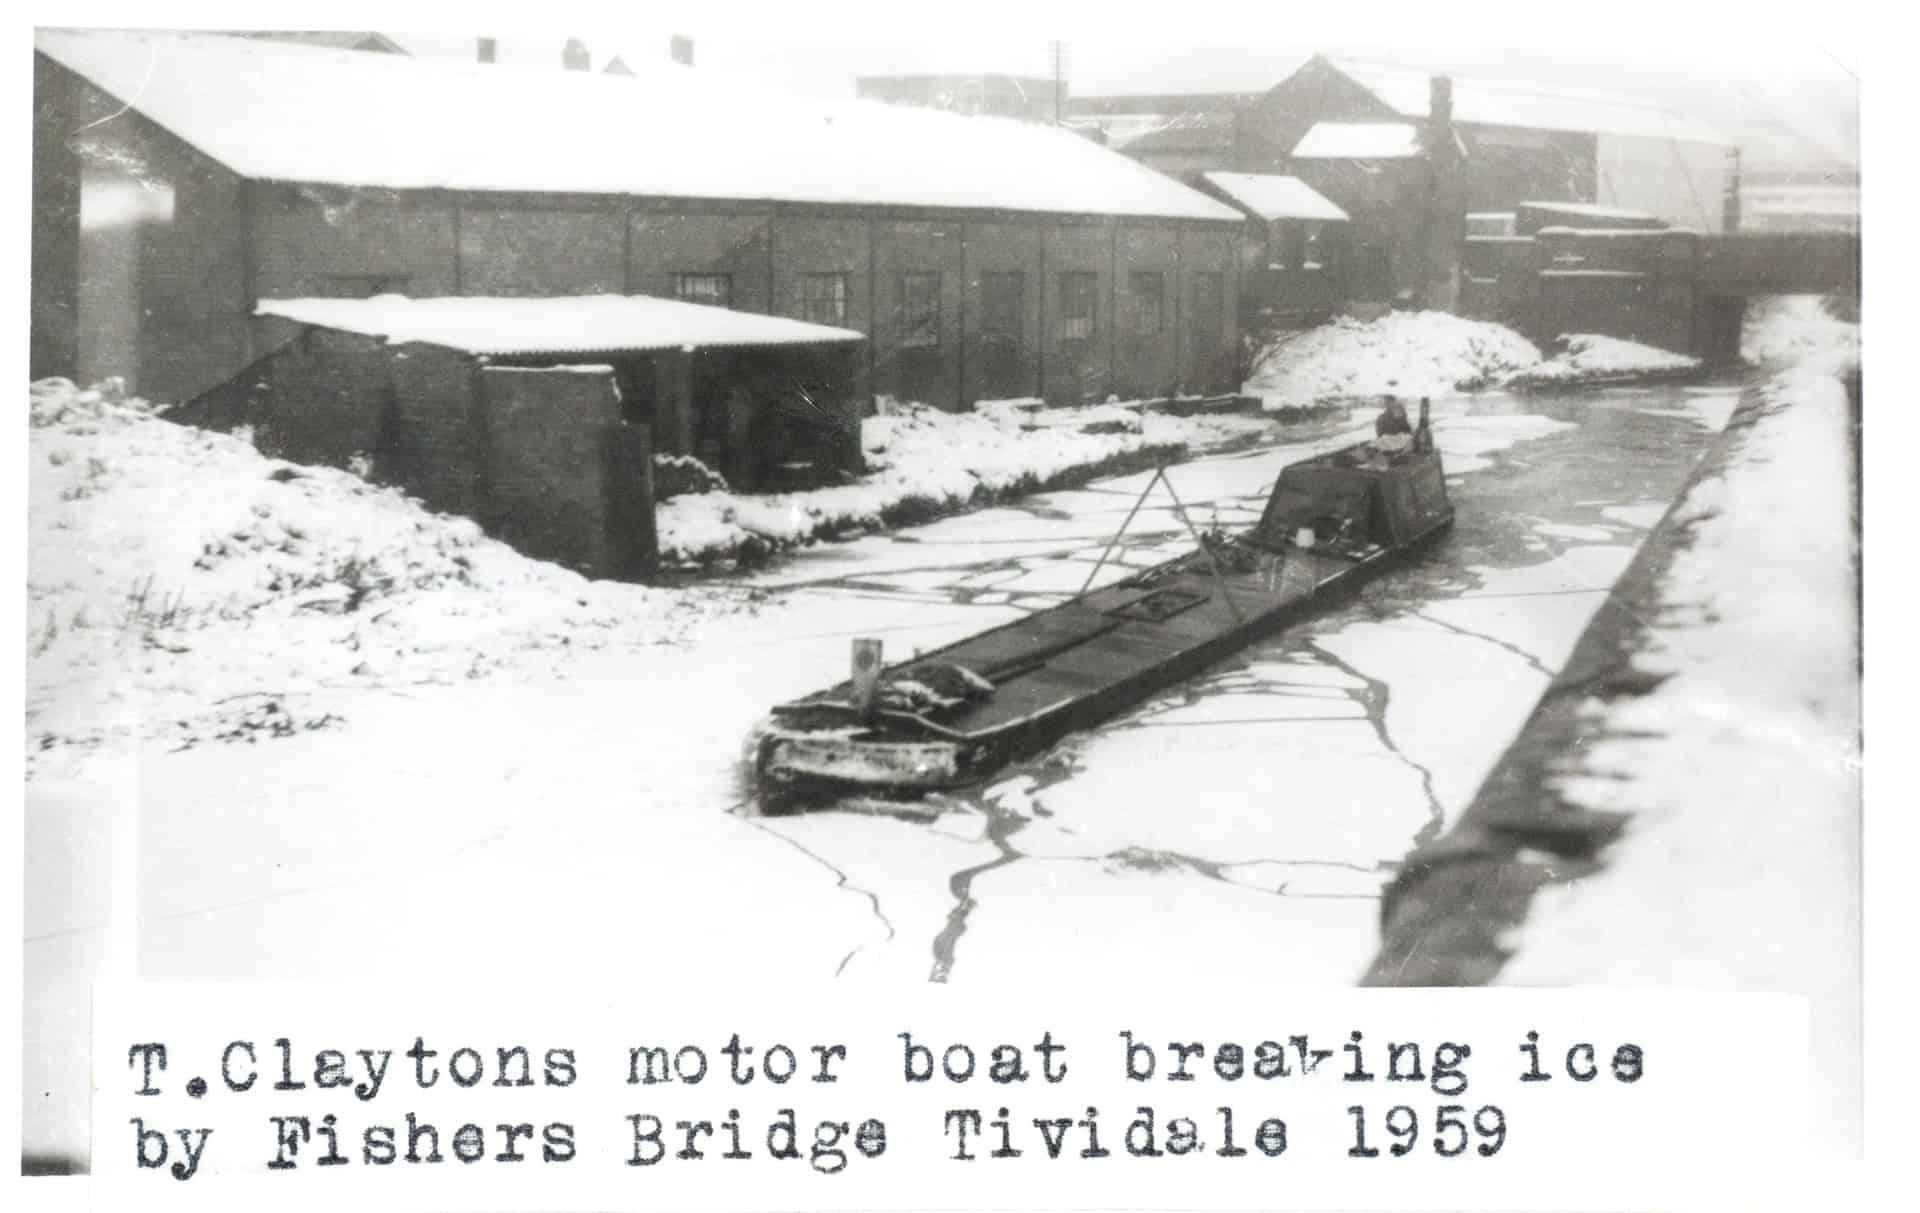 Claytons motor boat breaking ice by Fishers Bridge Tividale 1559